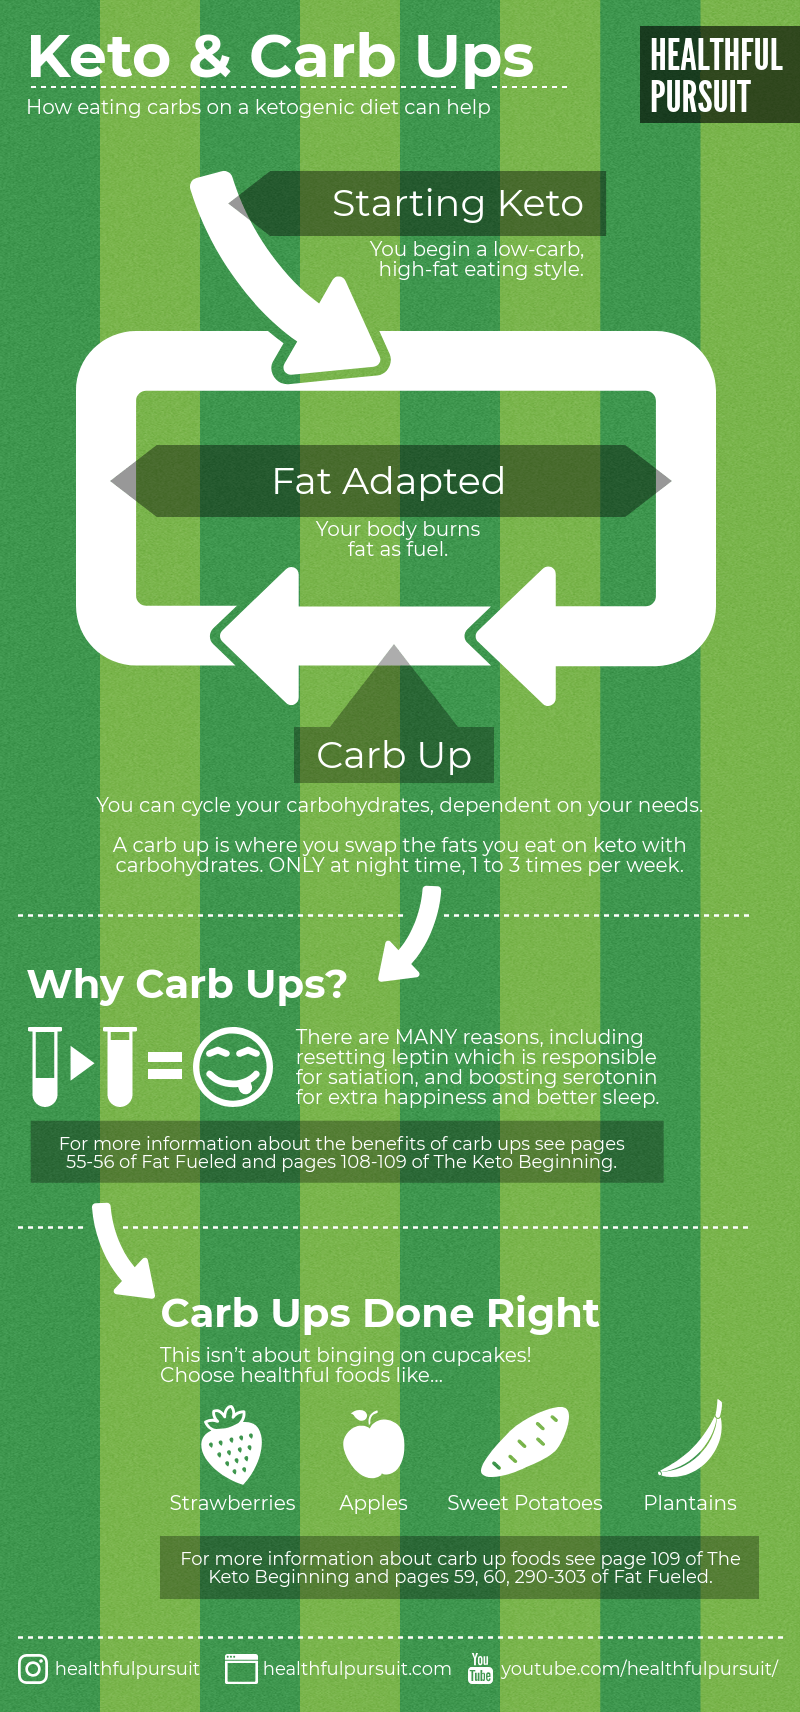 Keto & Carb Ups infographic